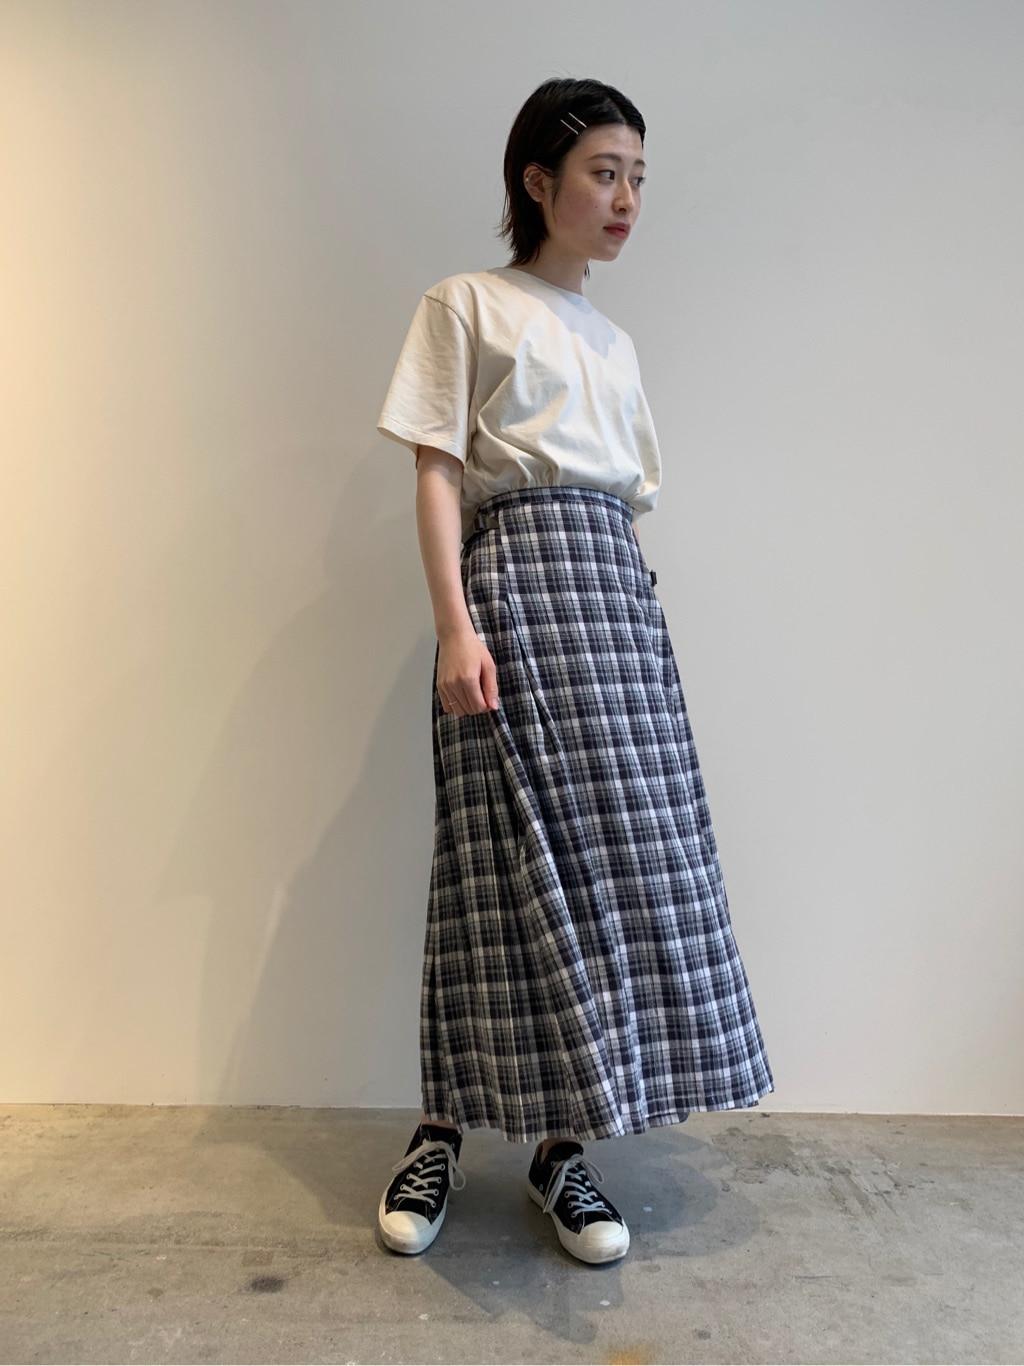 yuni 名古屋栄路面 身長:162cm 2020.06.05